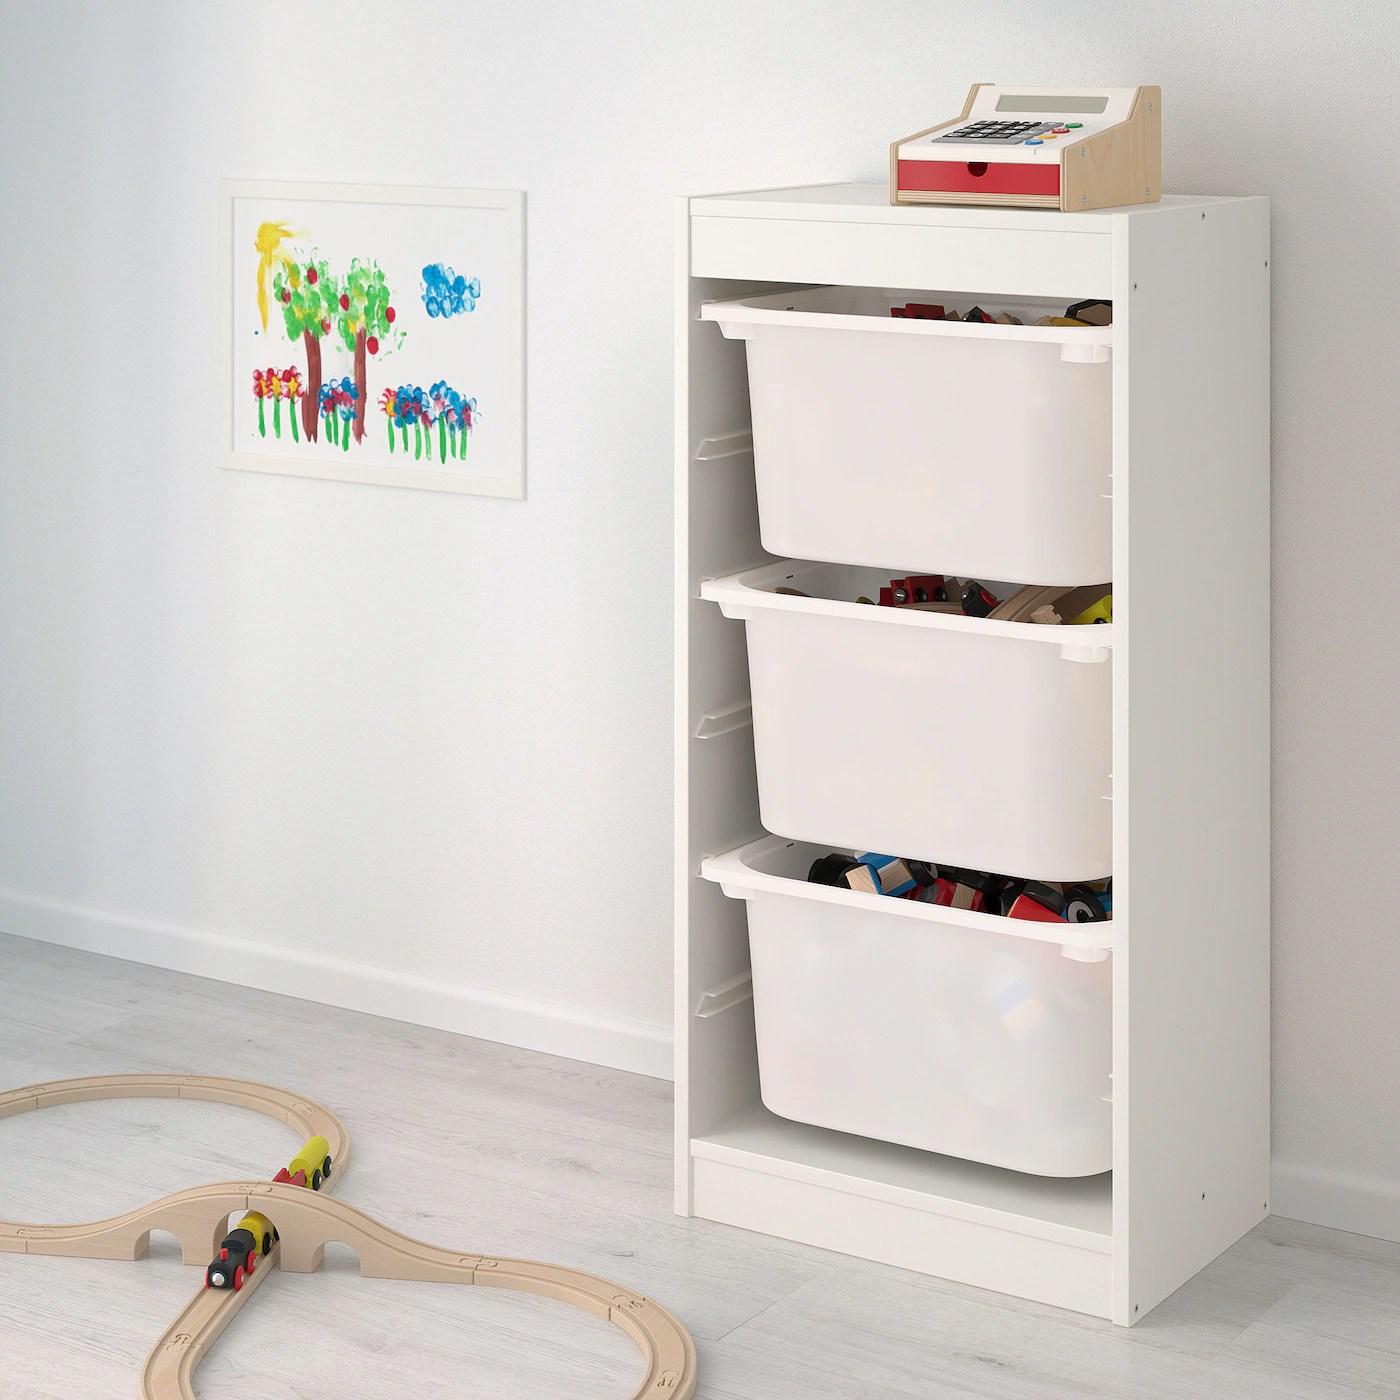 Almacenaje para dormitorio infantil de Ikea TROFAST